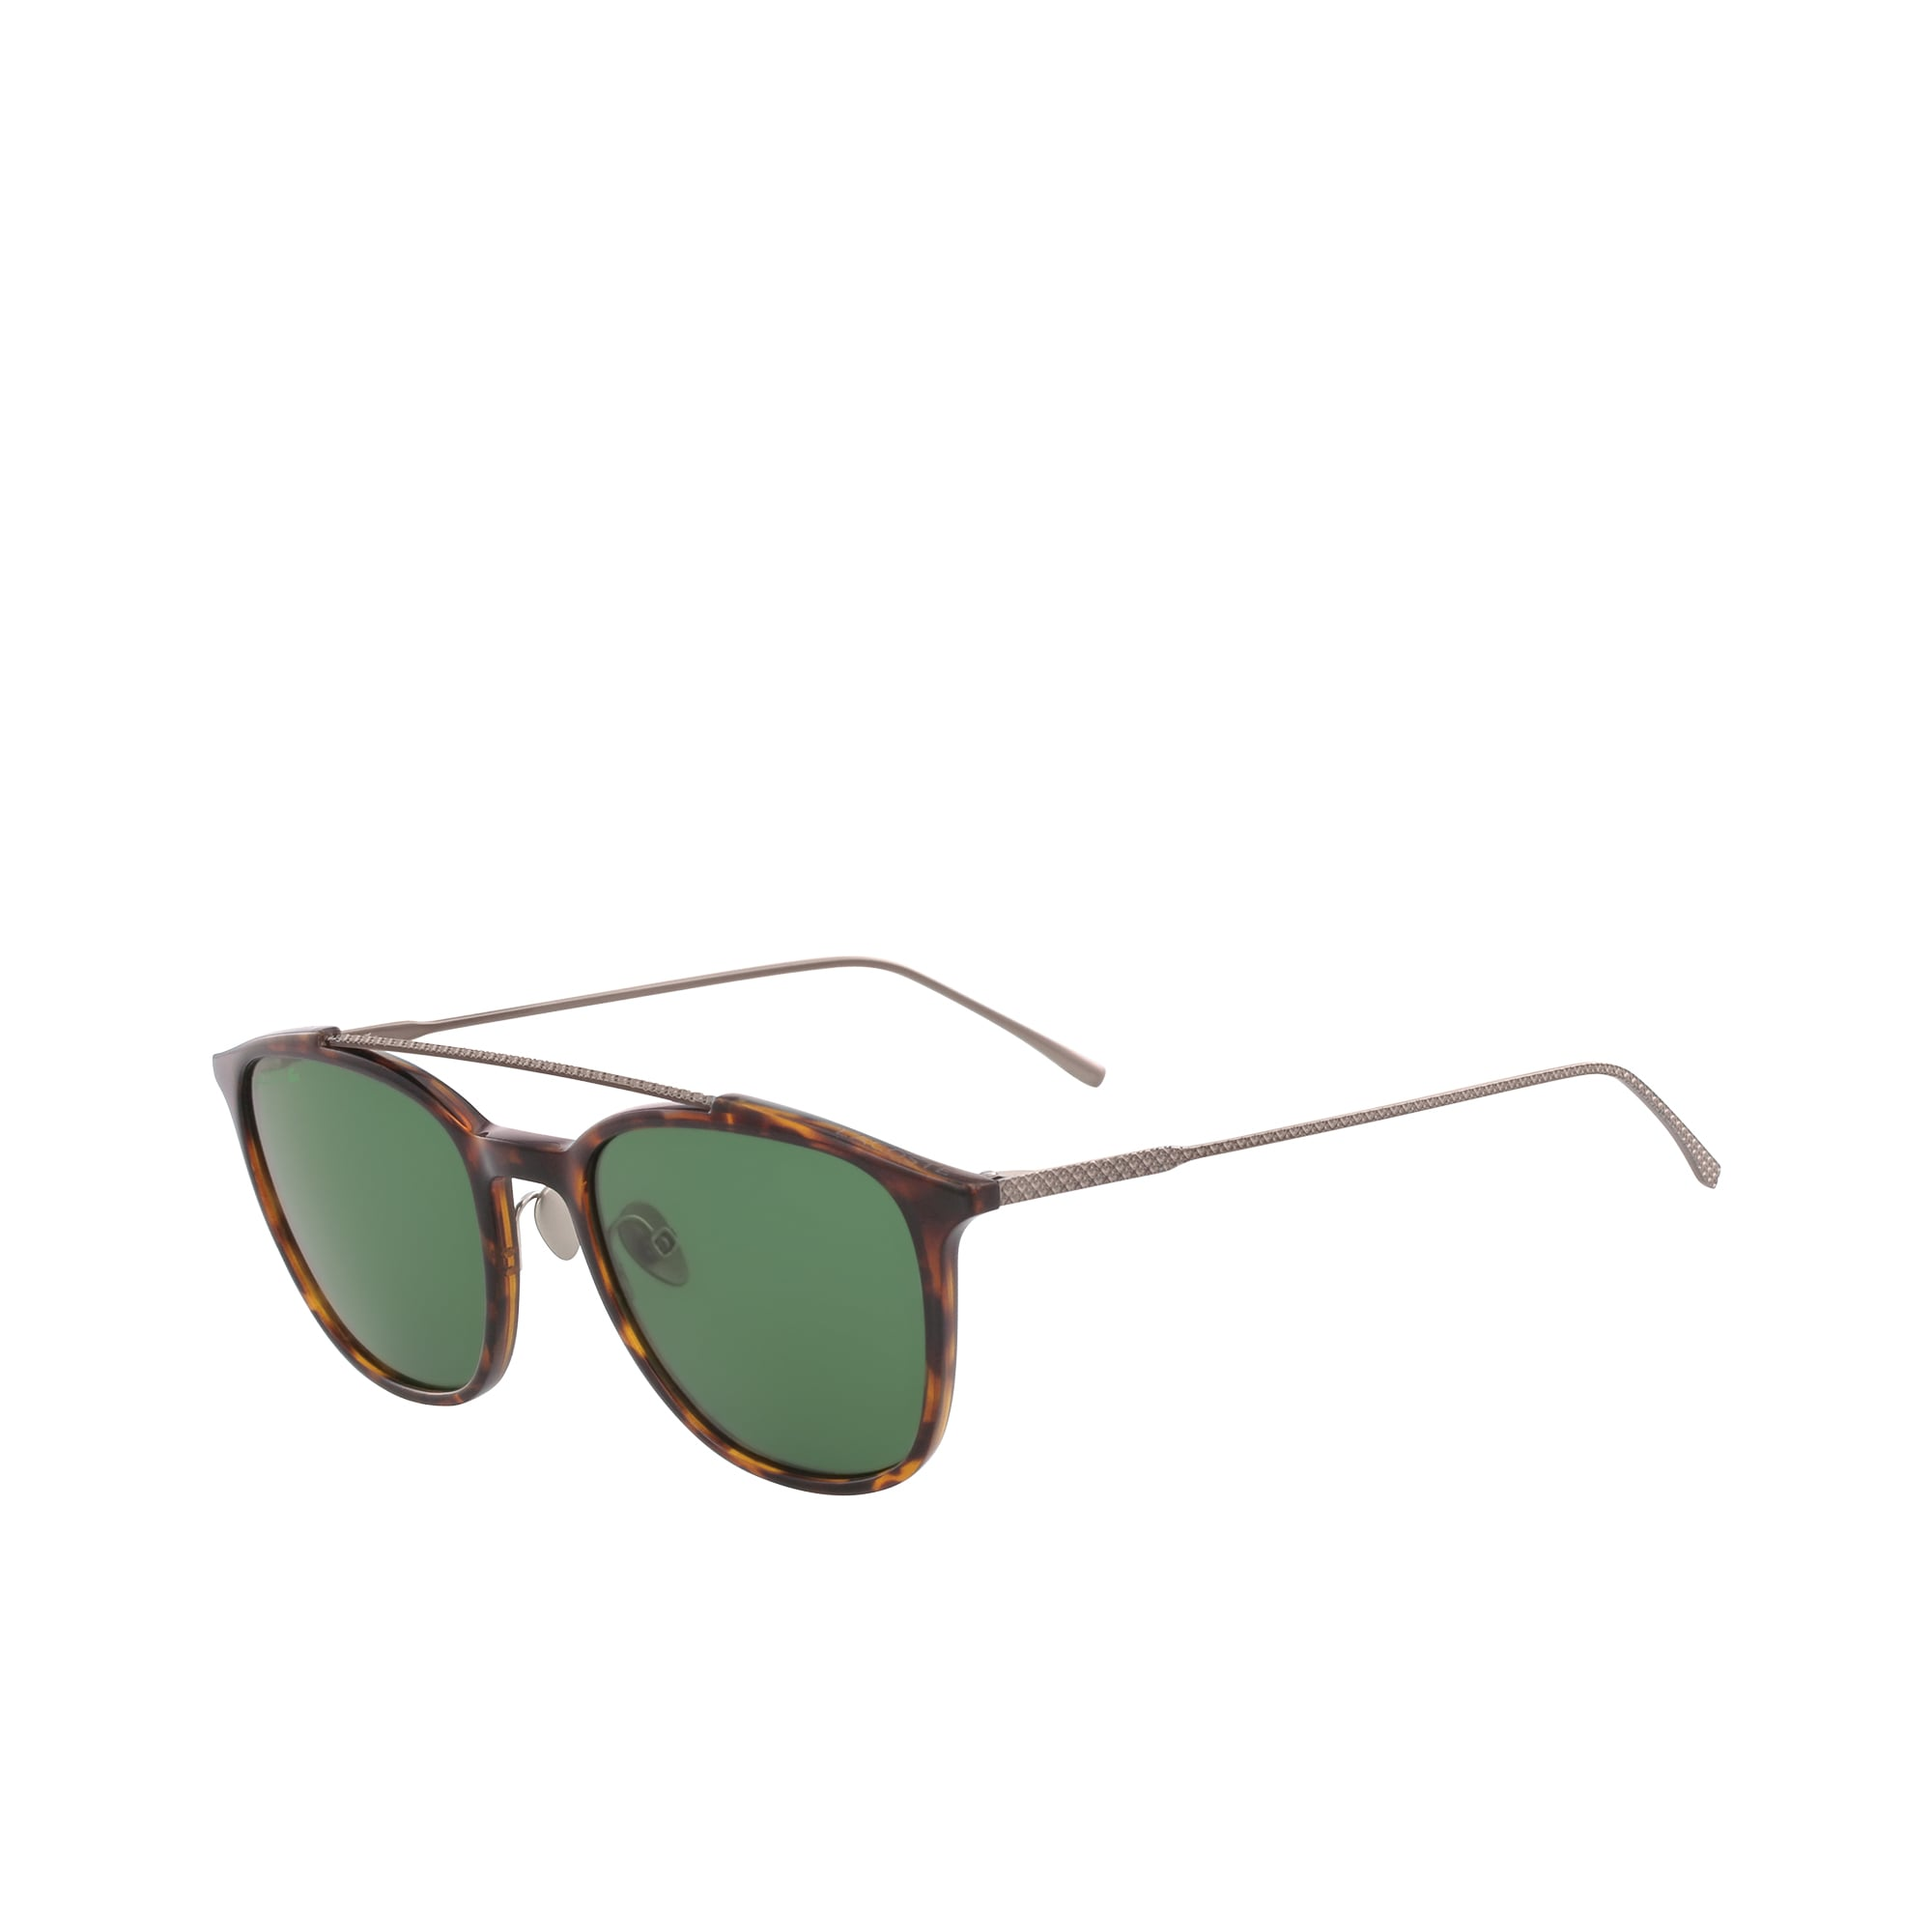 daabcf26c40 Metal Ultrathin Sunglasses. £154.00. Paris Collection